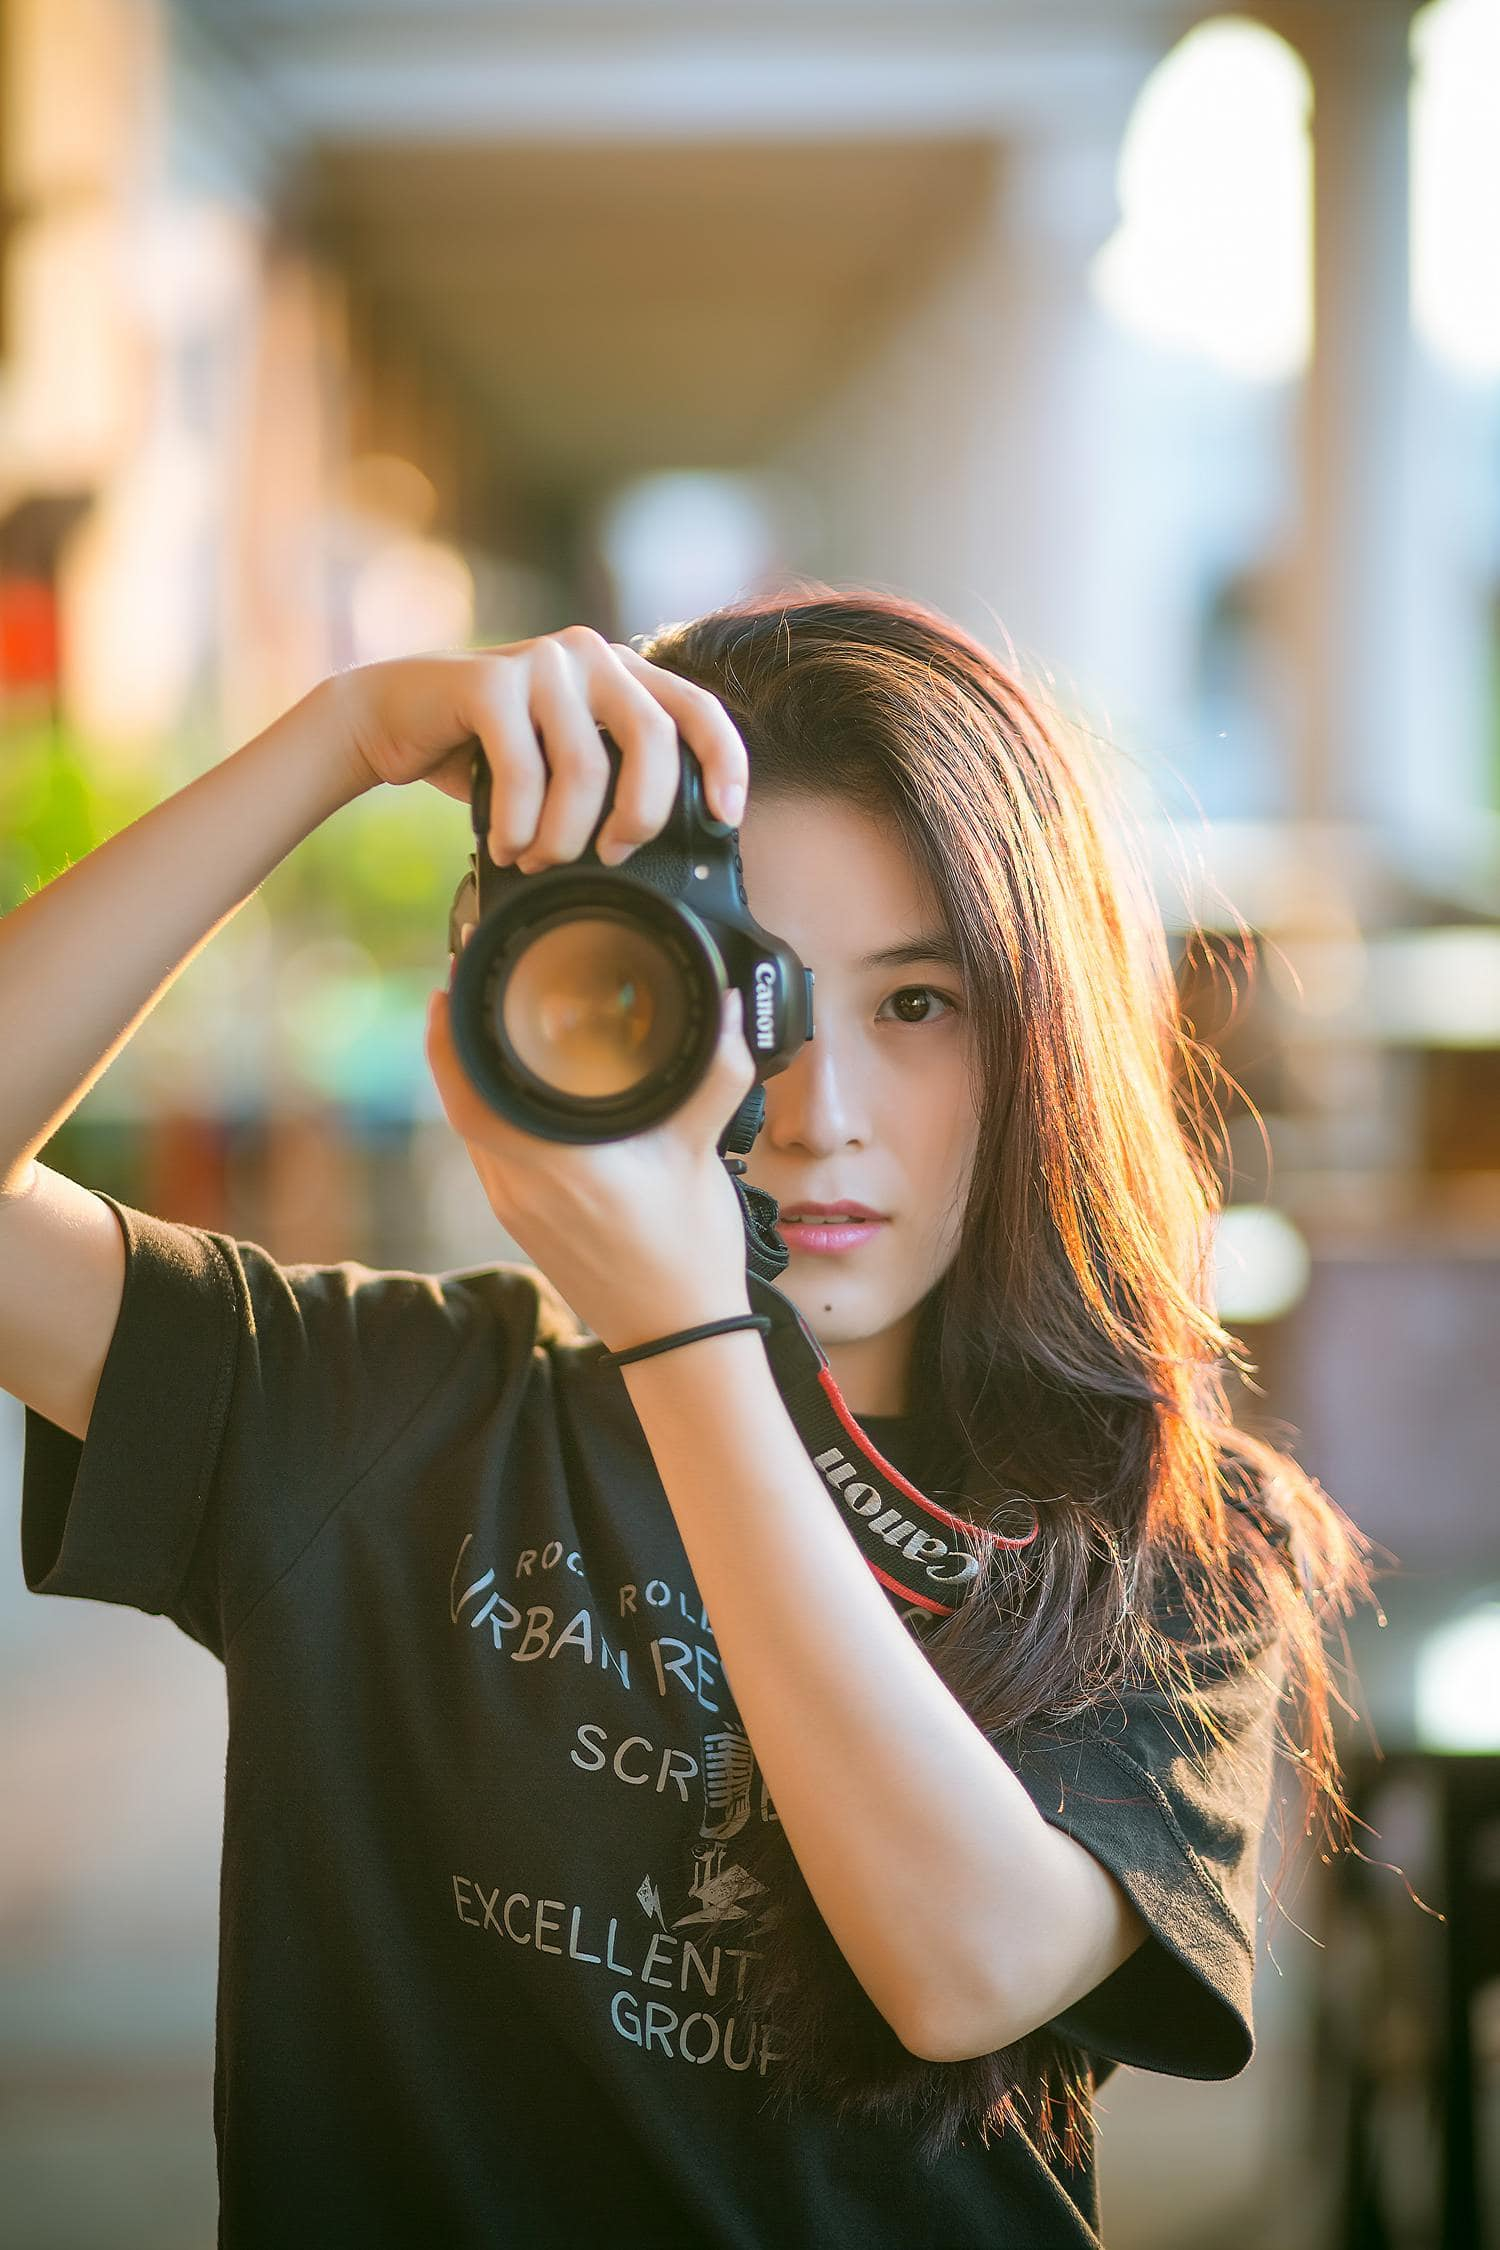 Fotógrafa con una cámara réflex Canon